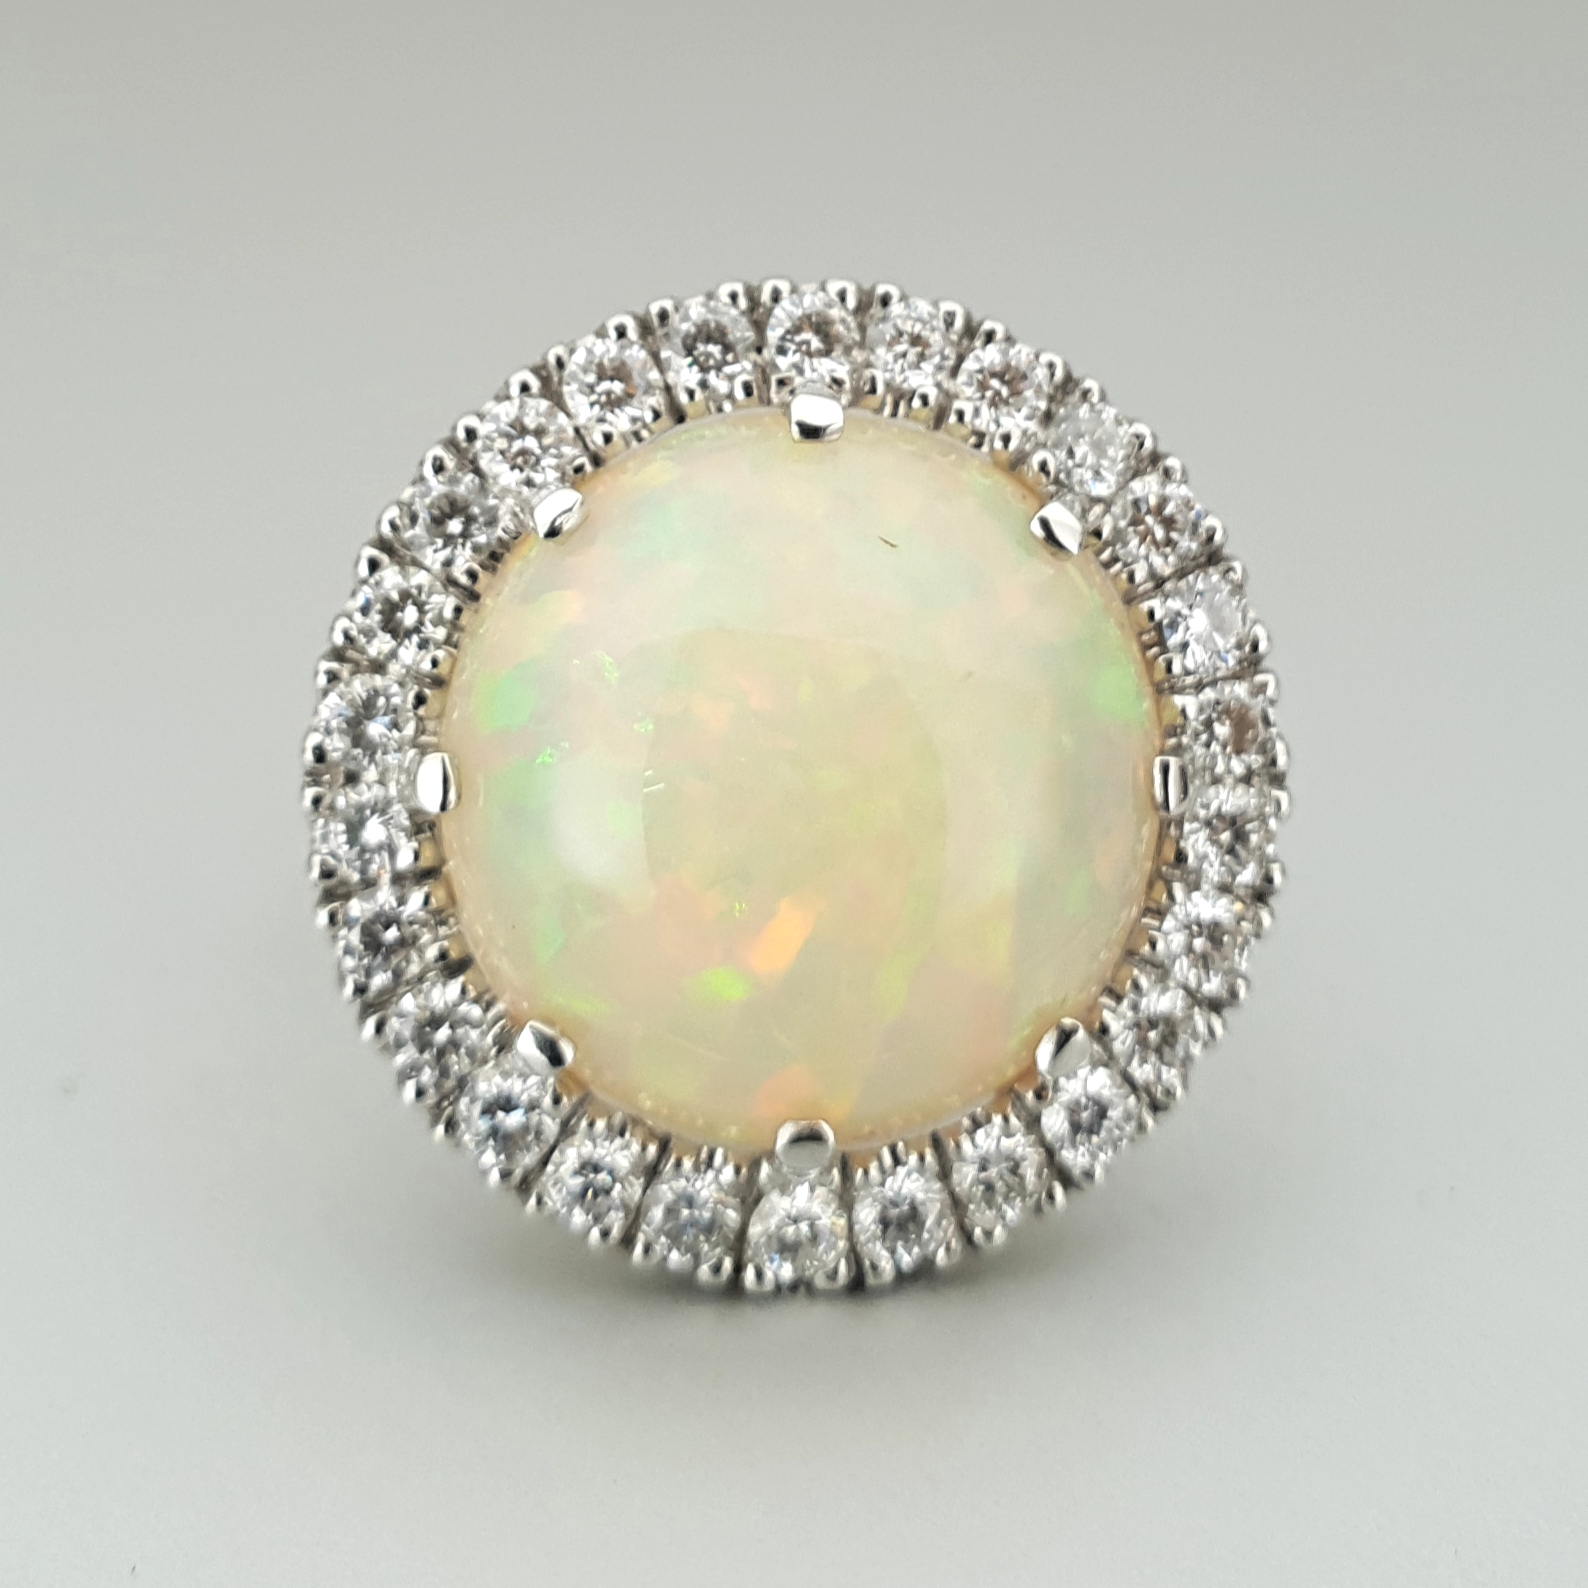 'Valentin' Ethiopian Opal and Diamond Ring in Platinum